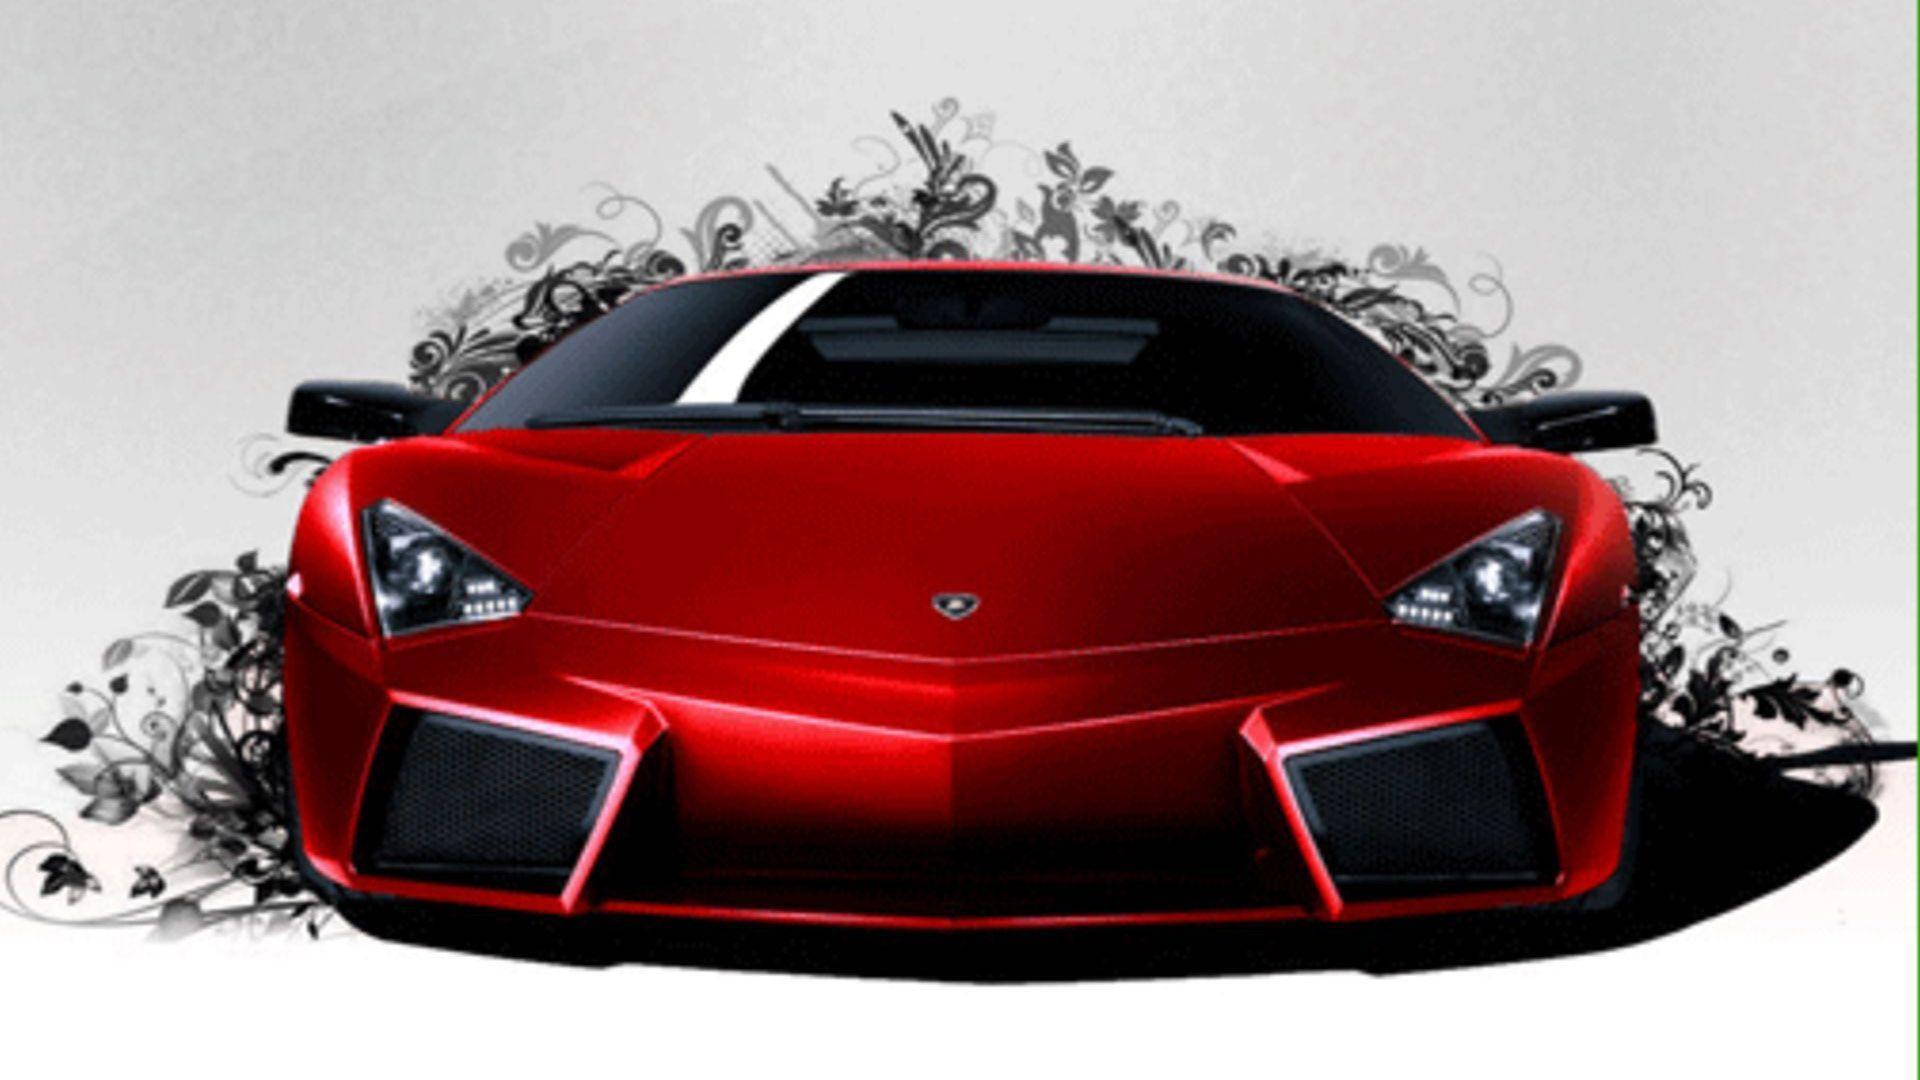 Tron Lamborghini Black Red Car Wallpapers Hd Desktop: Red Lamborghini Wallpapers